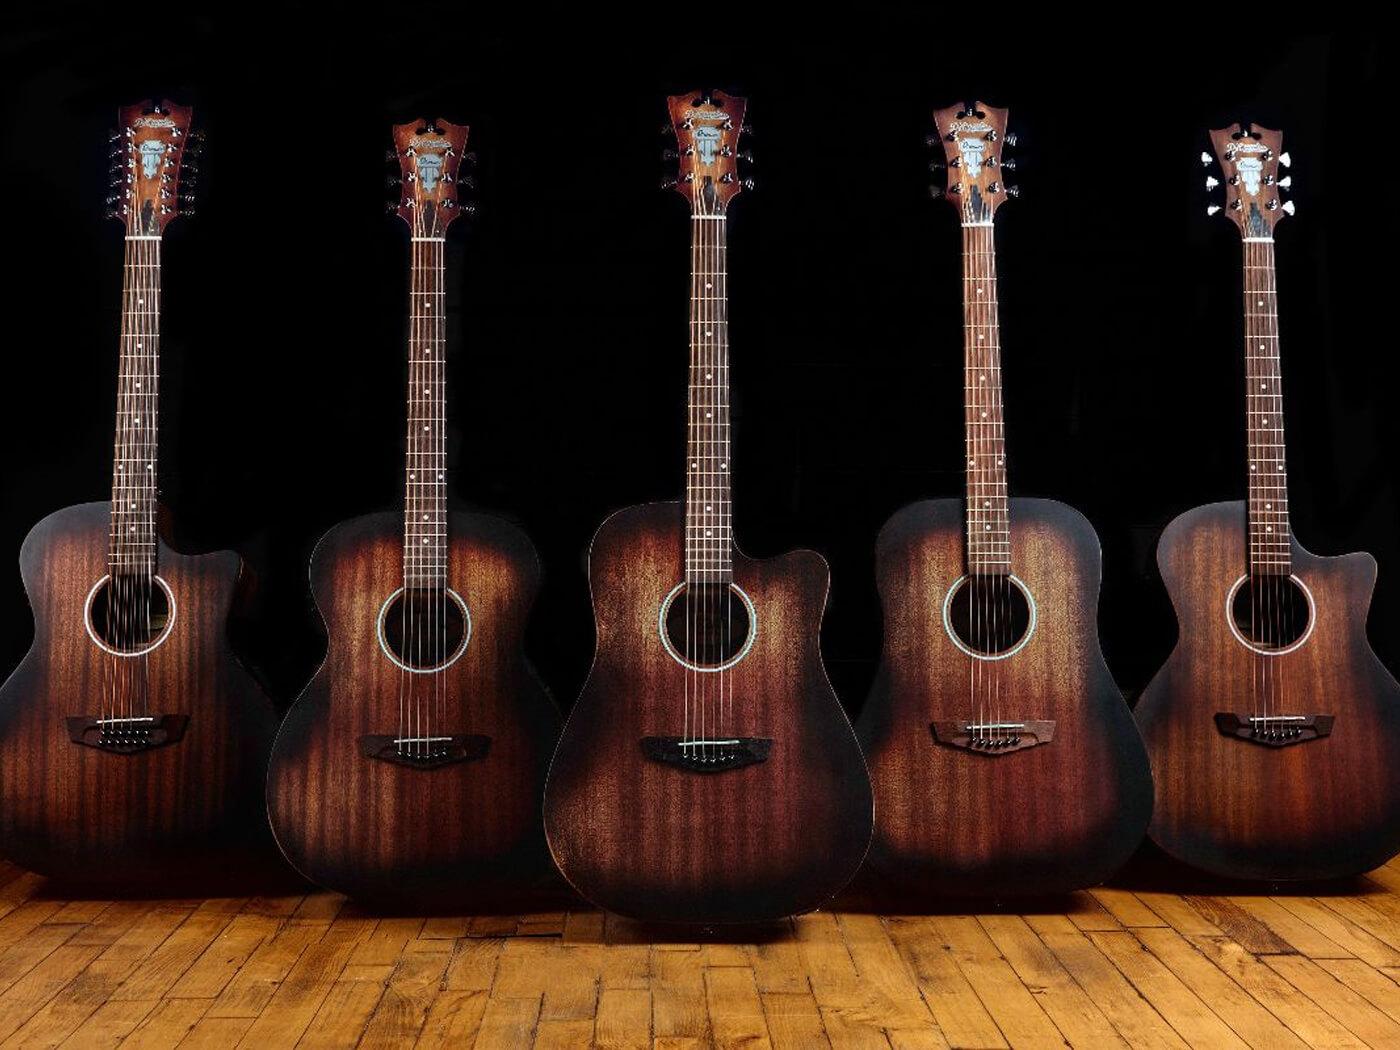 dangelico-premier-acoustic-aged-mahogany finish onemanz